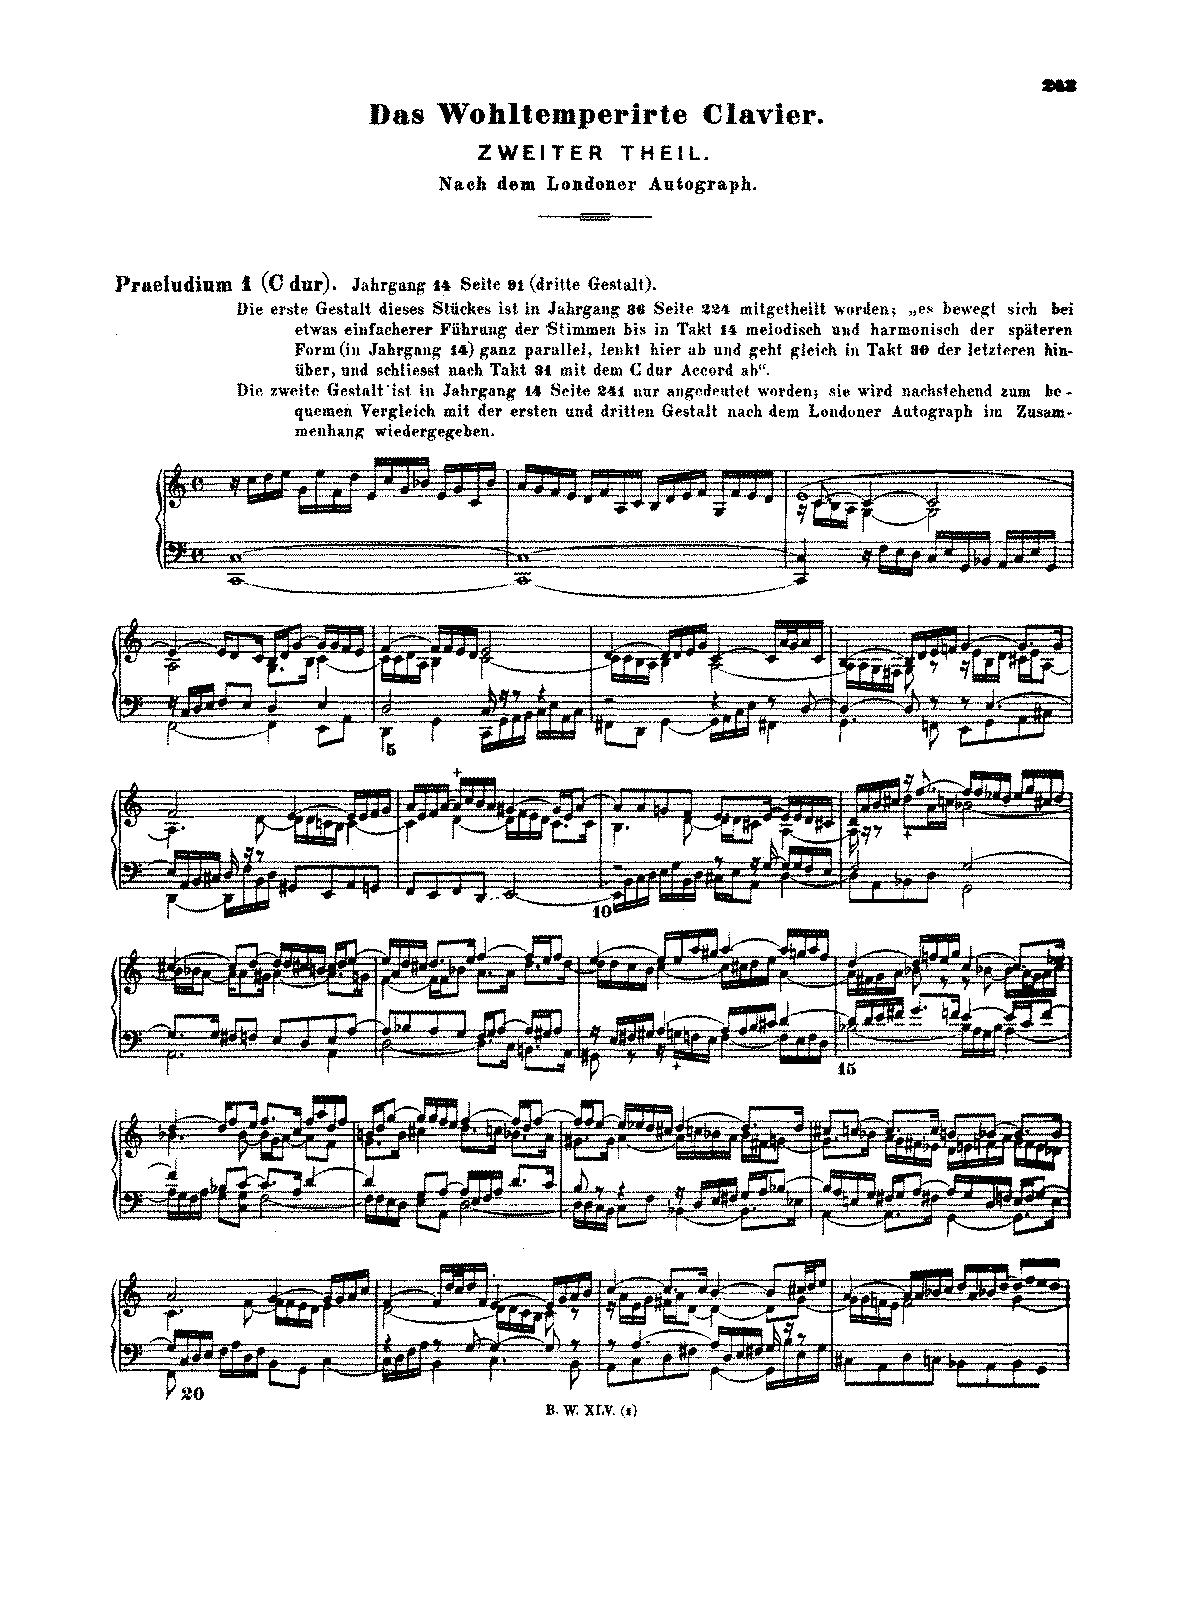 das wohltemperierte klavier ii bwv bach johann  das wohltemperierte klavier ii bwv 870 893 bach johann sebastian petrucci music library public sheet music